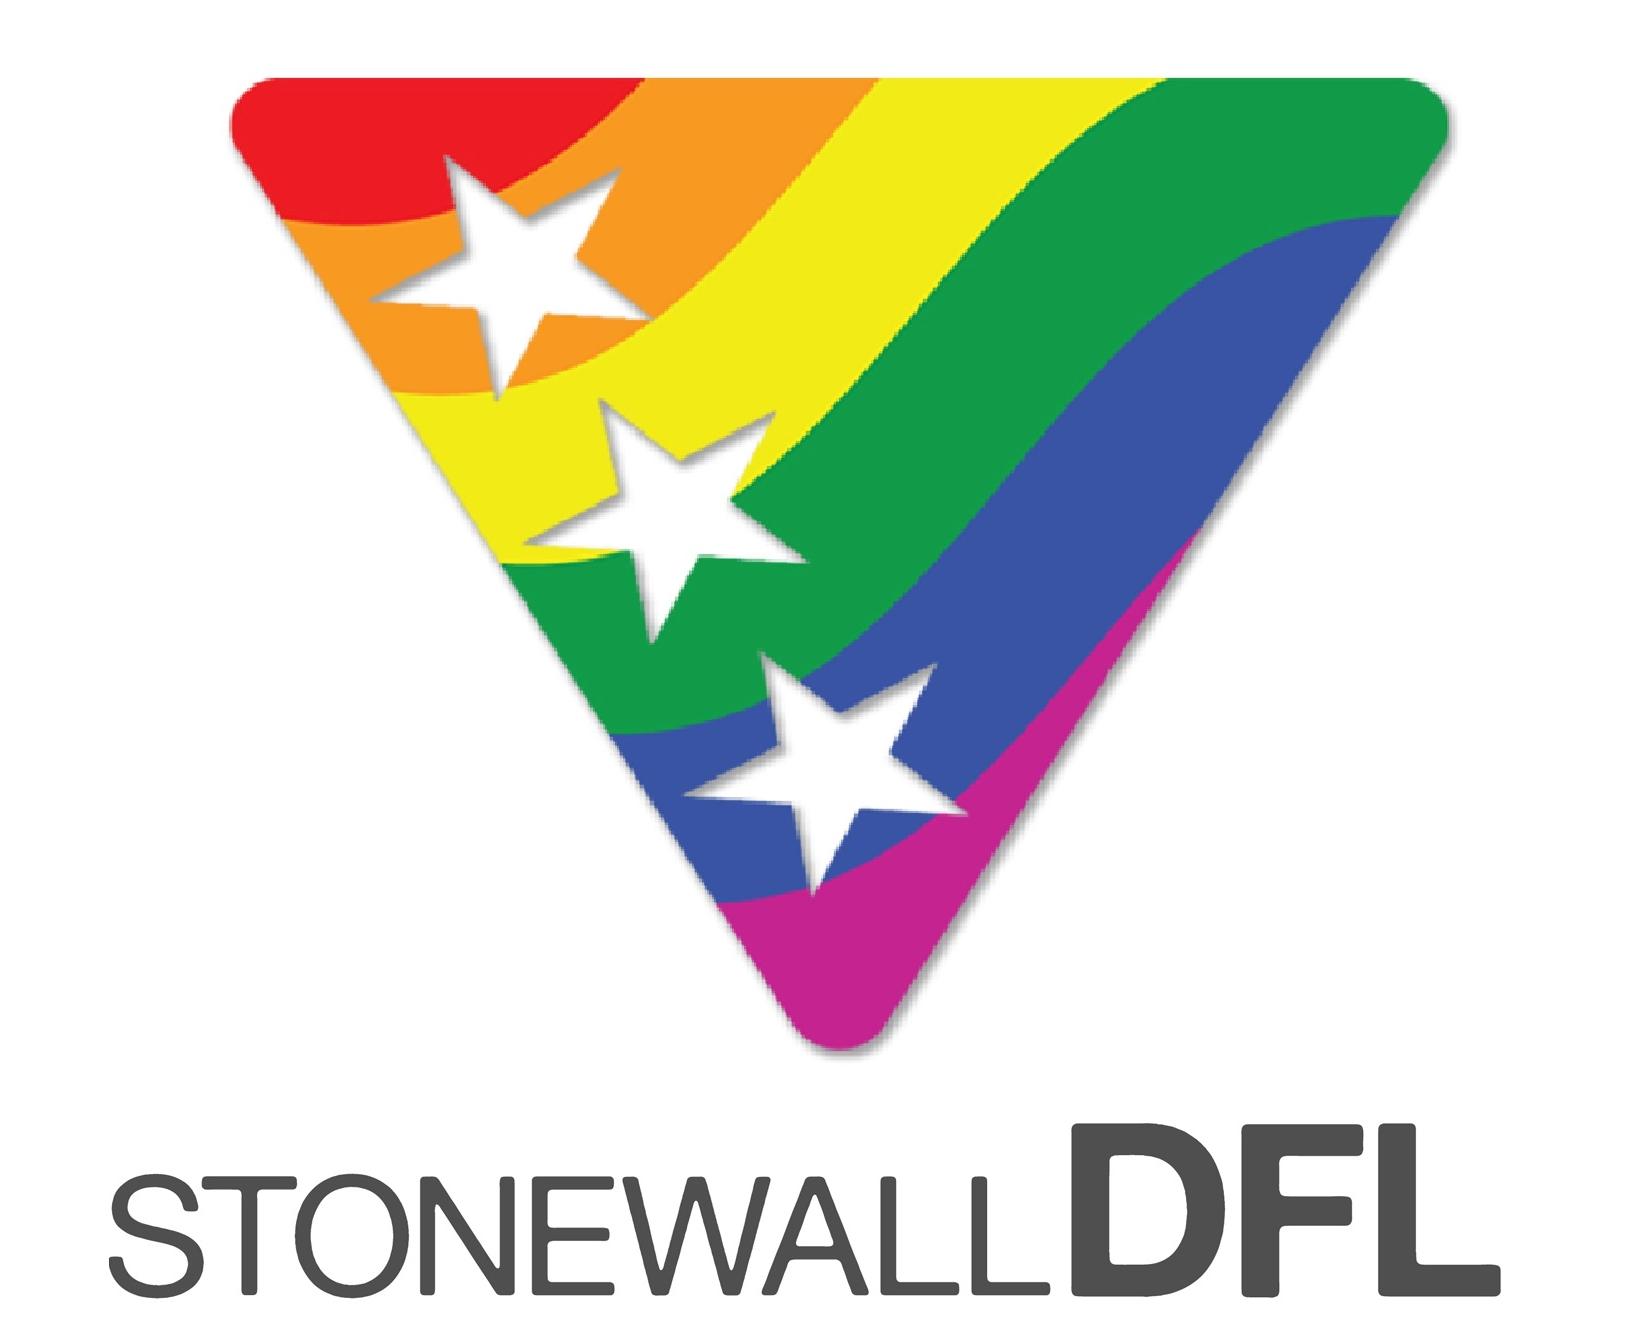 stonewallNew-back2.jpg